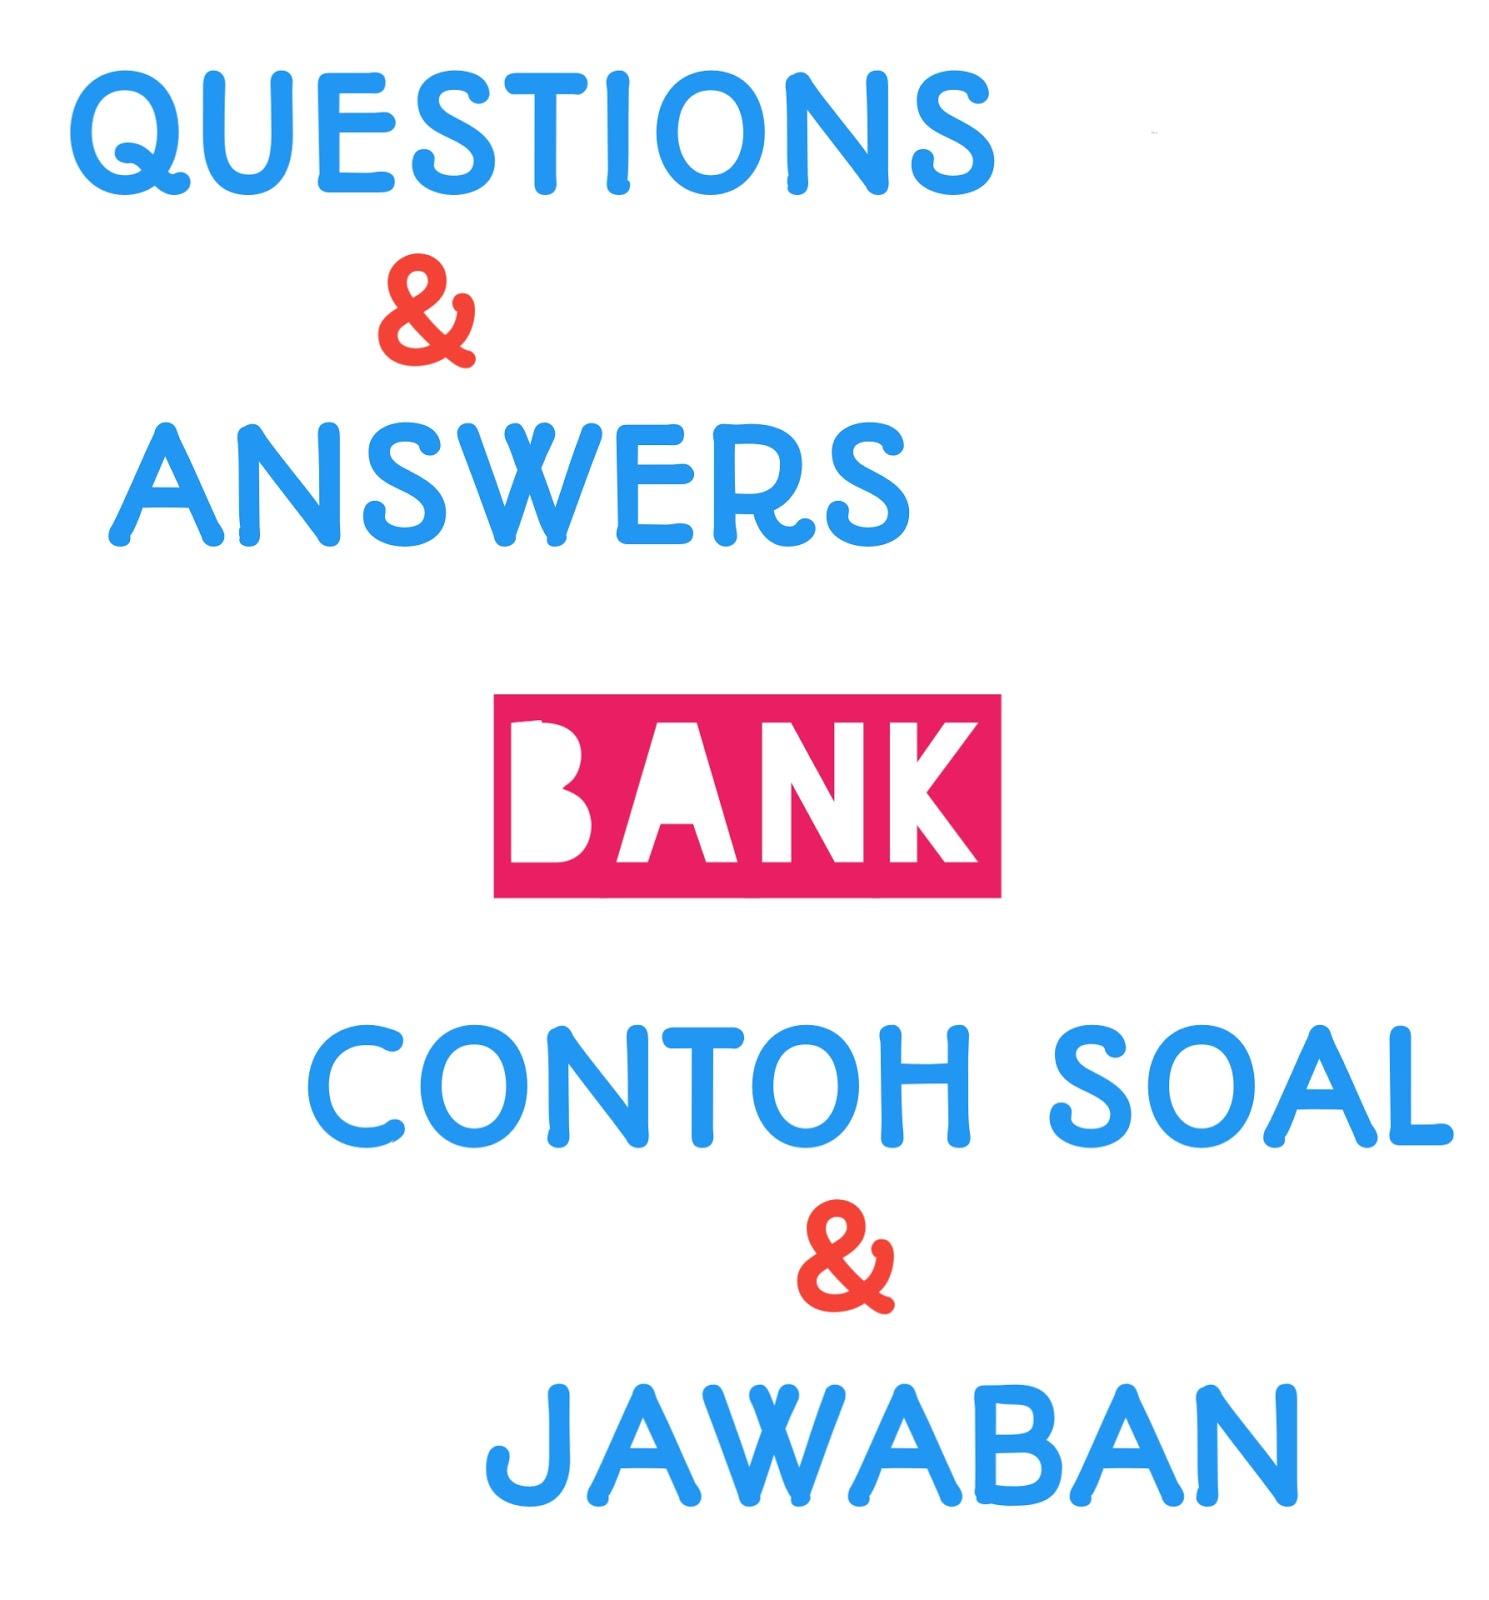 Contoh Soal No Any Dan Jawabannya Dunia Bahasa Inggris